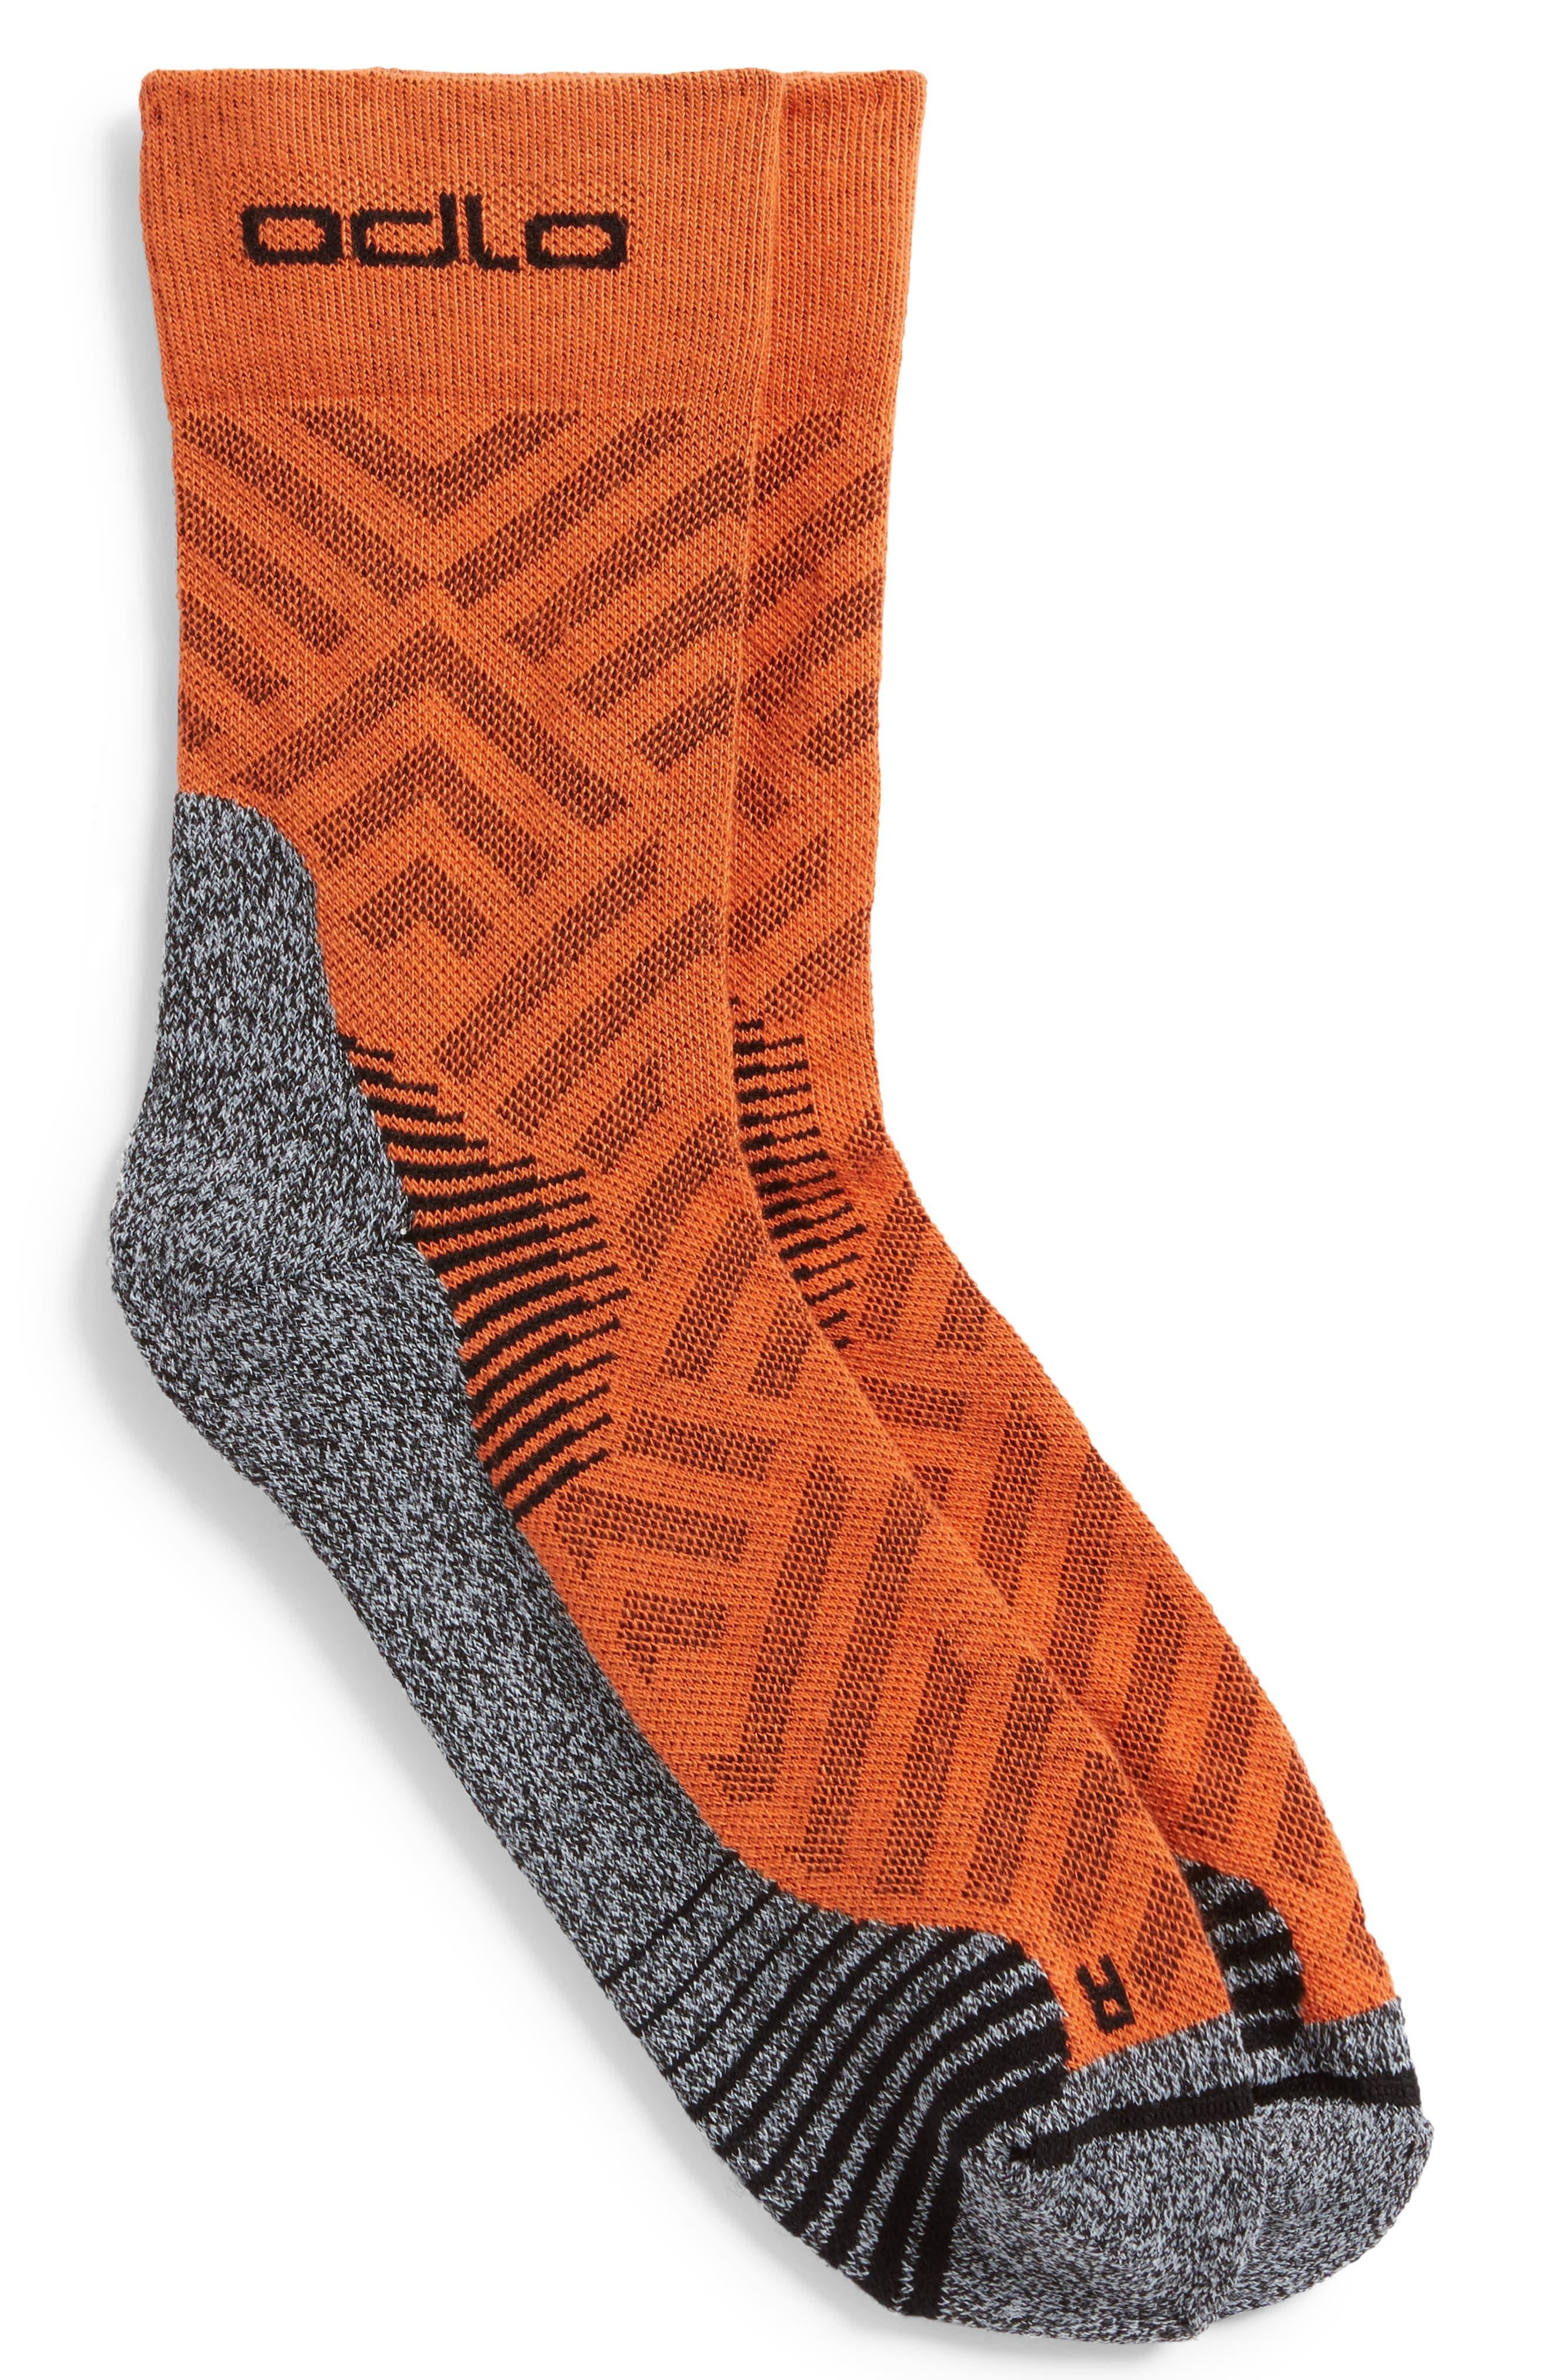 ODLO Mens Low Ceramicool Socks